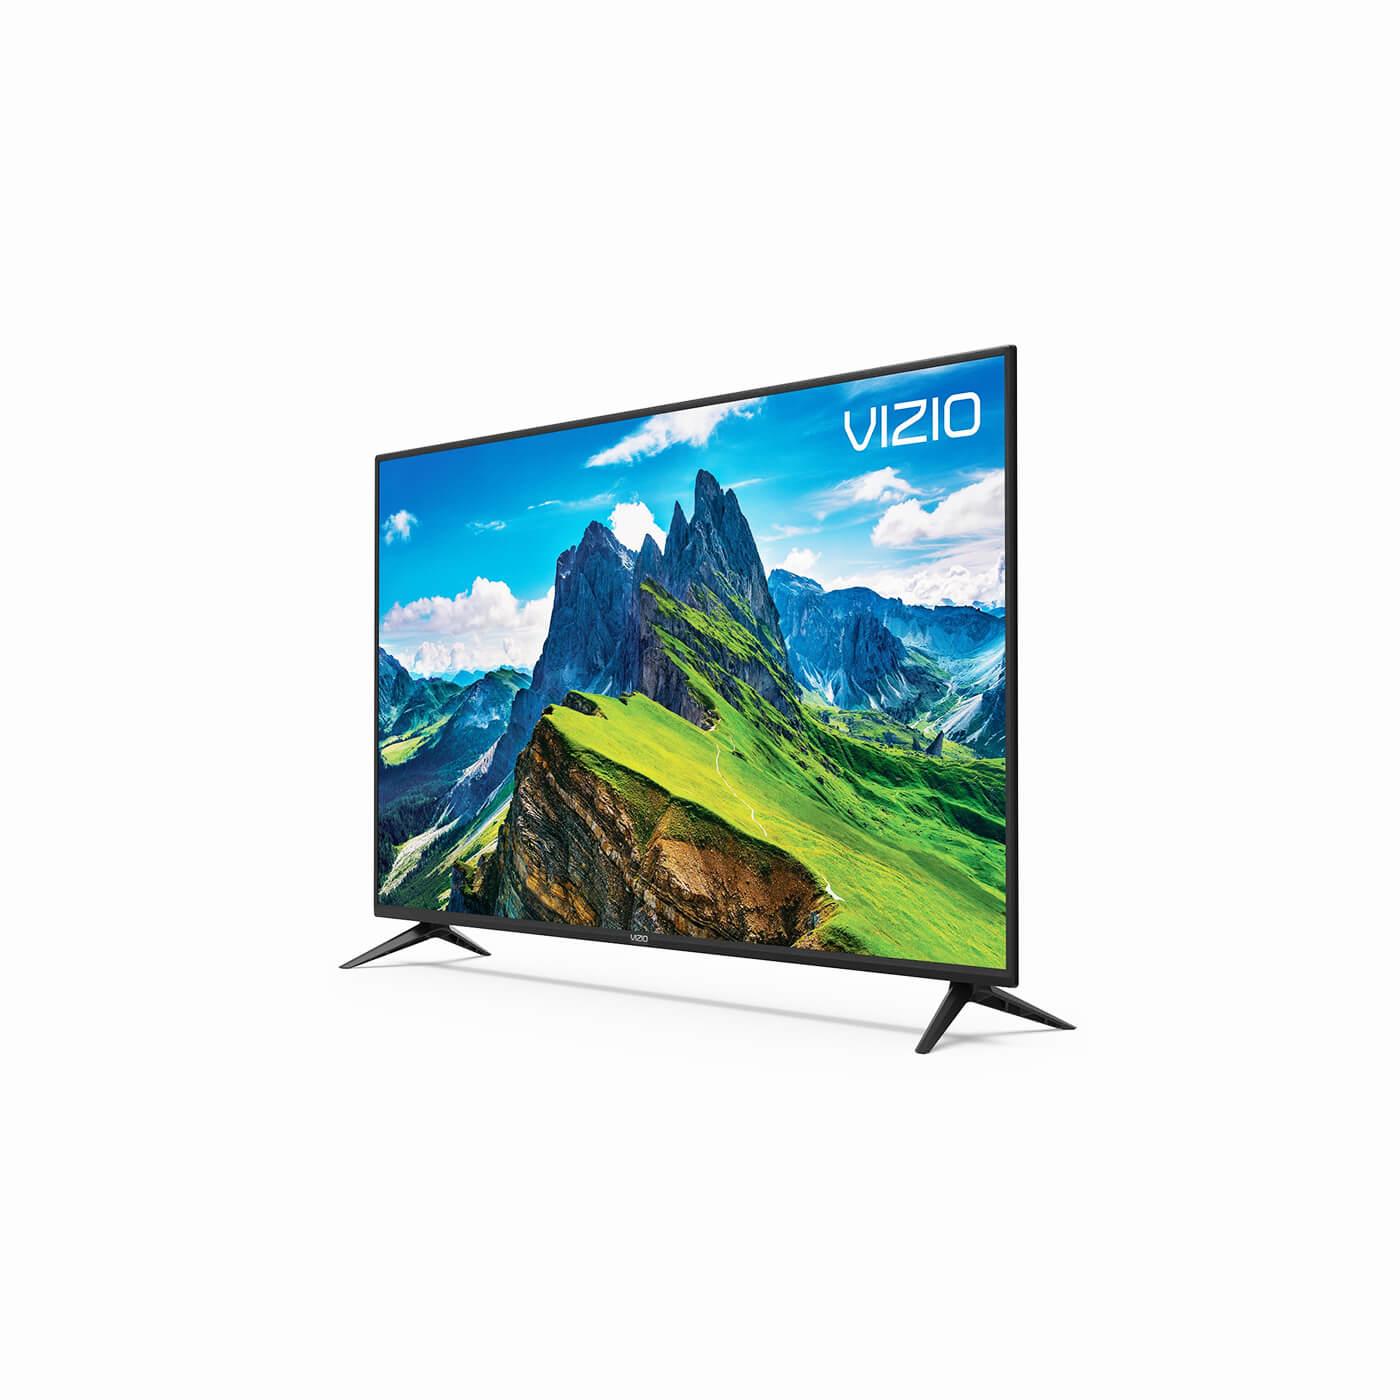 05.VIZIO V Series Class 4K HDR Smart TV